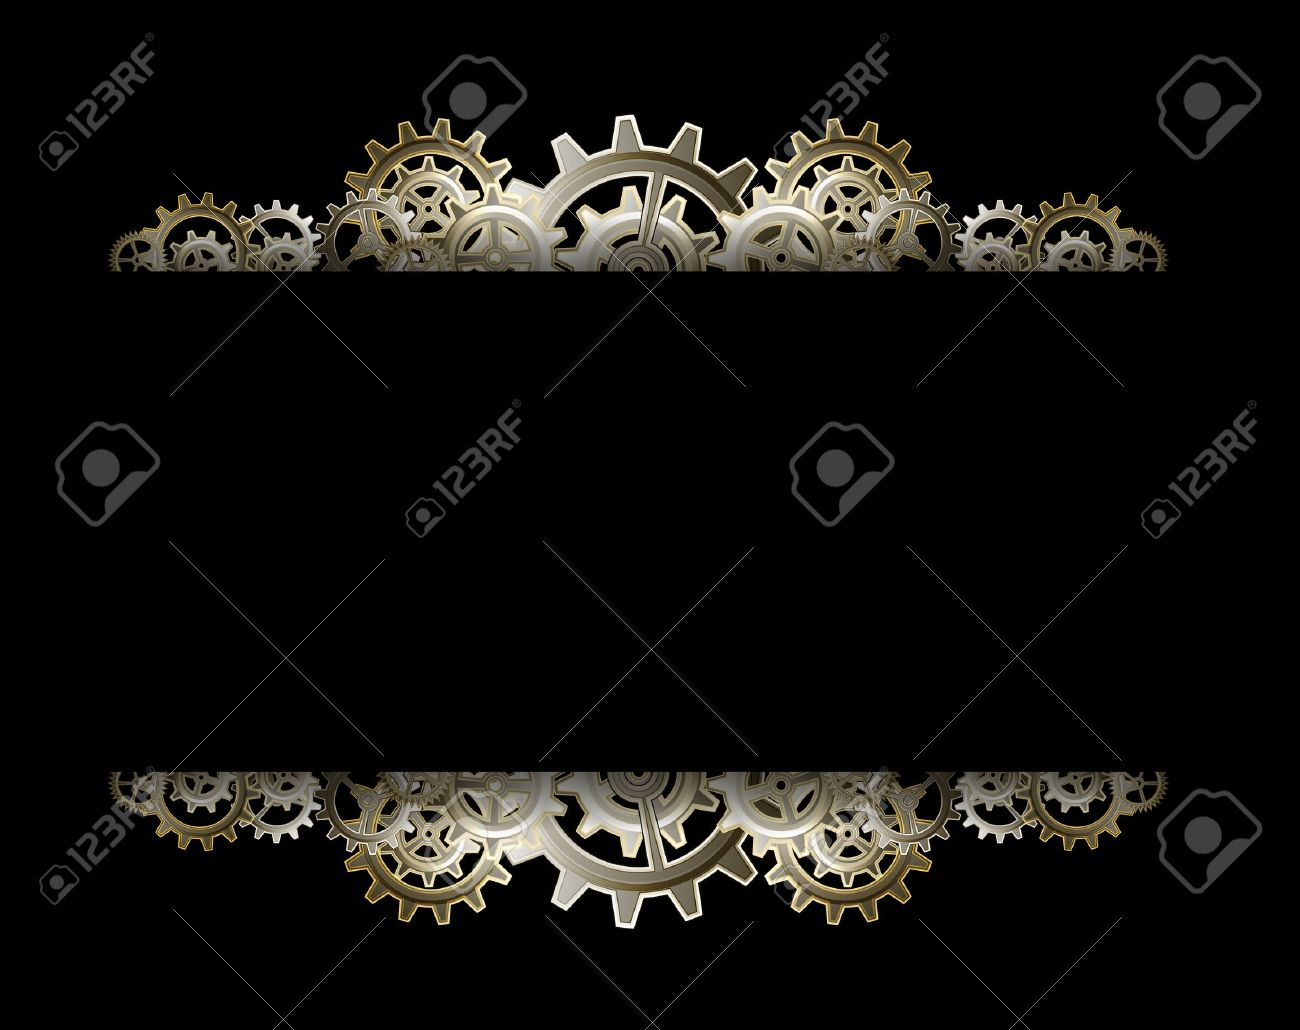 Steampunk gears frame - 24012680